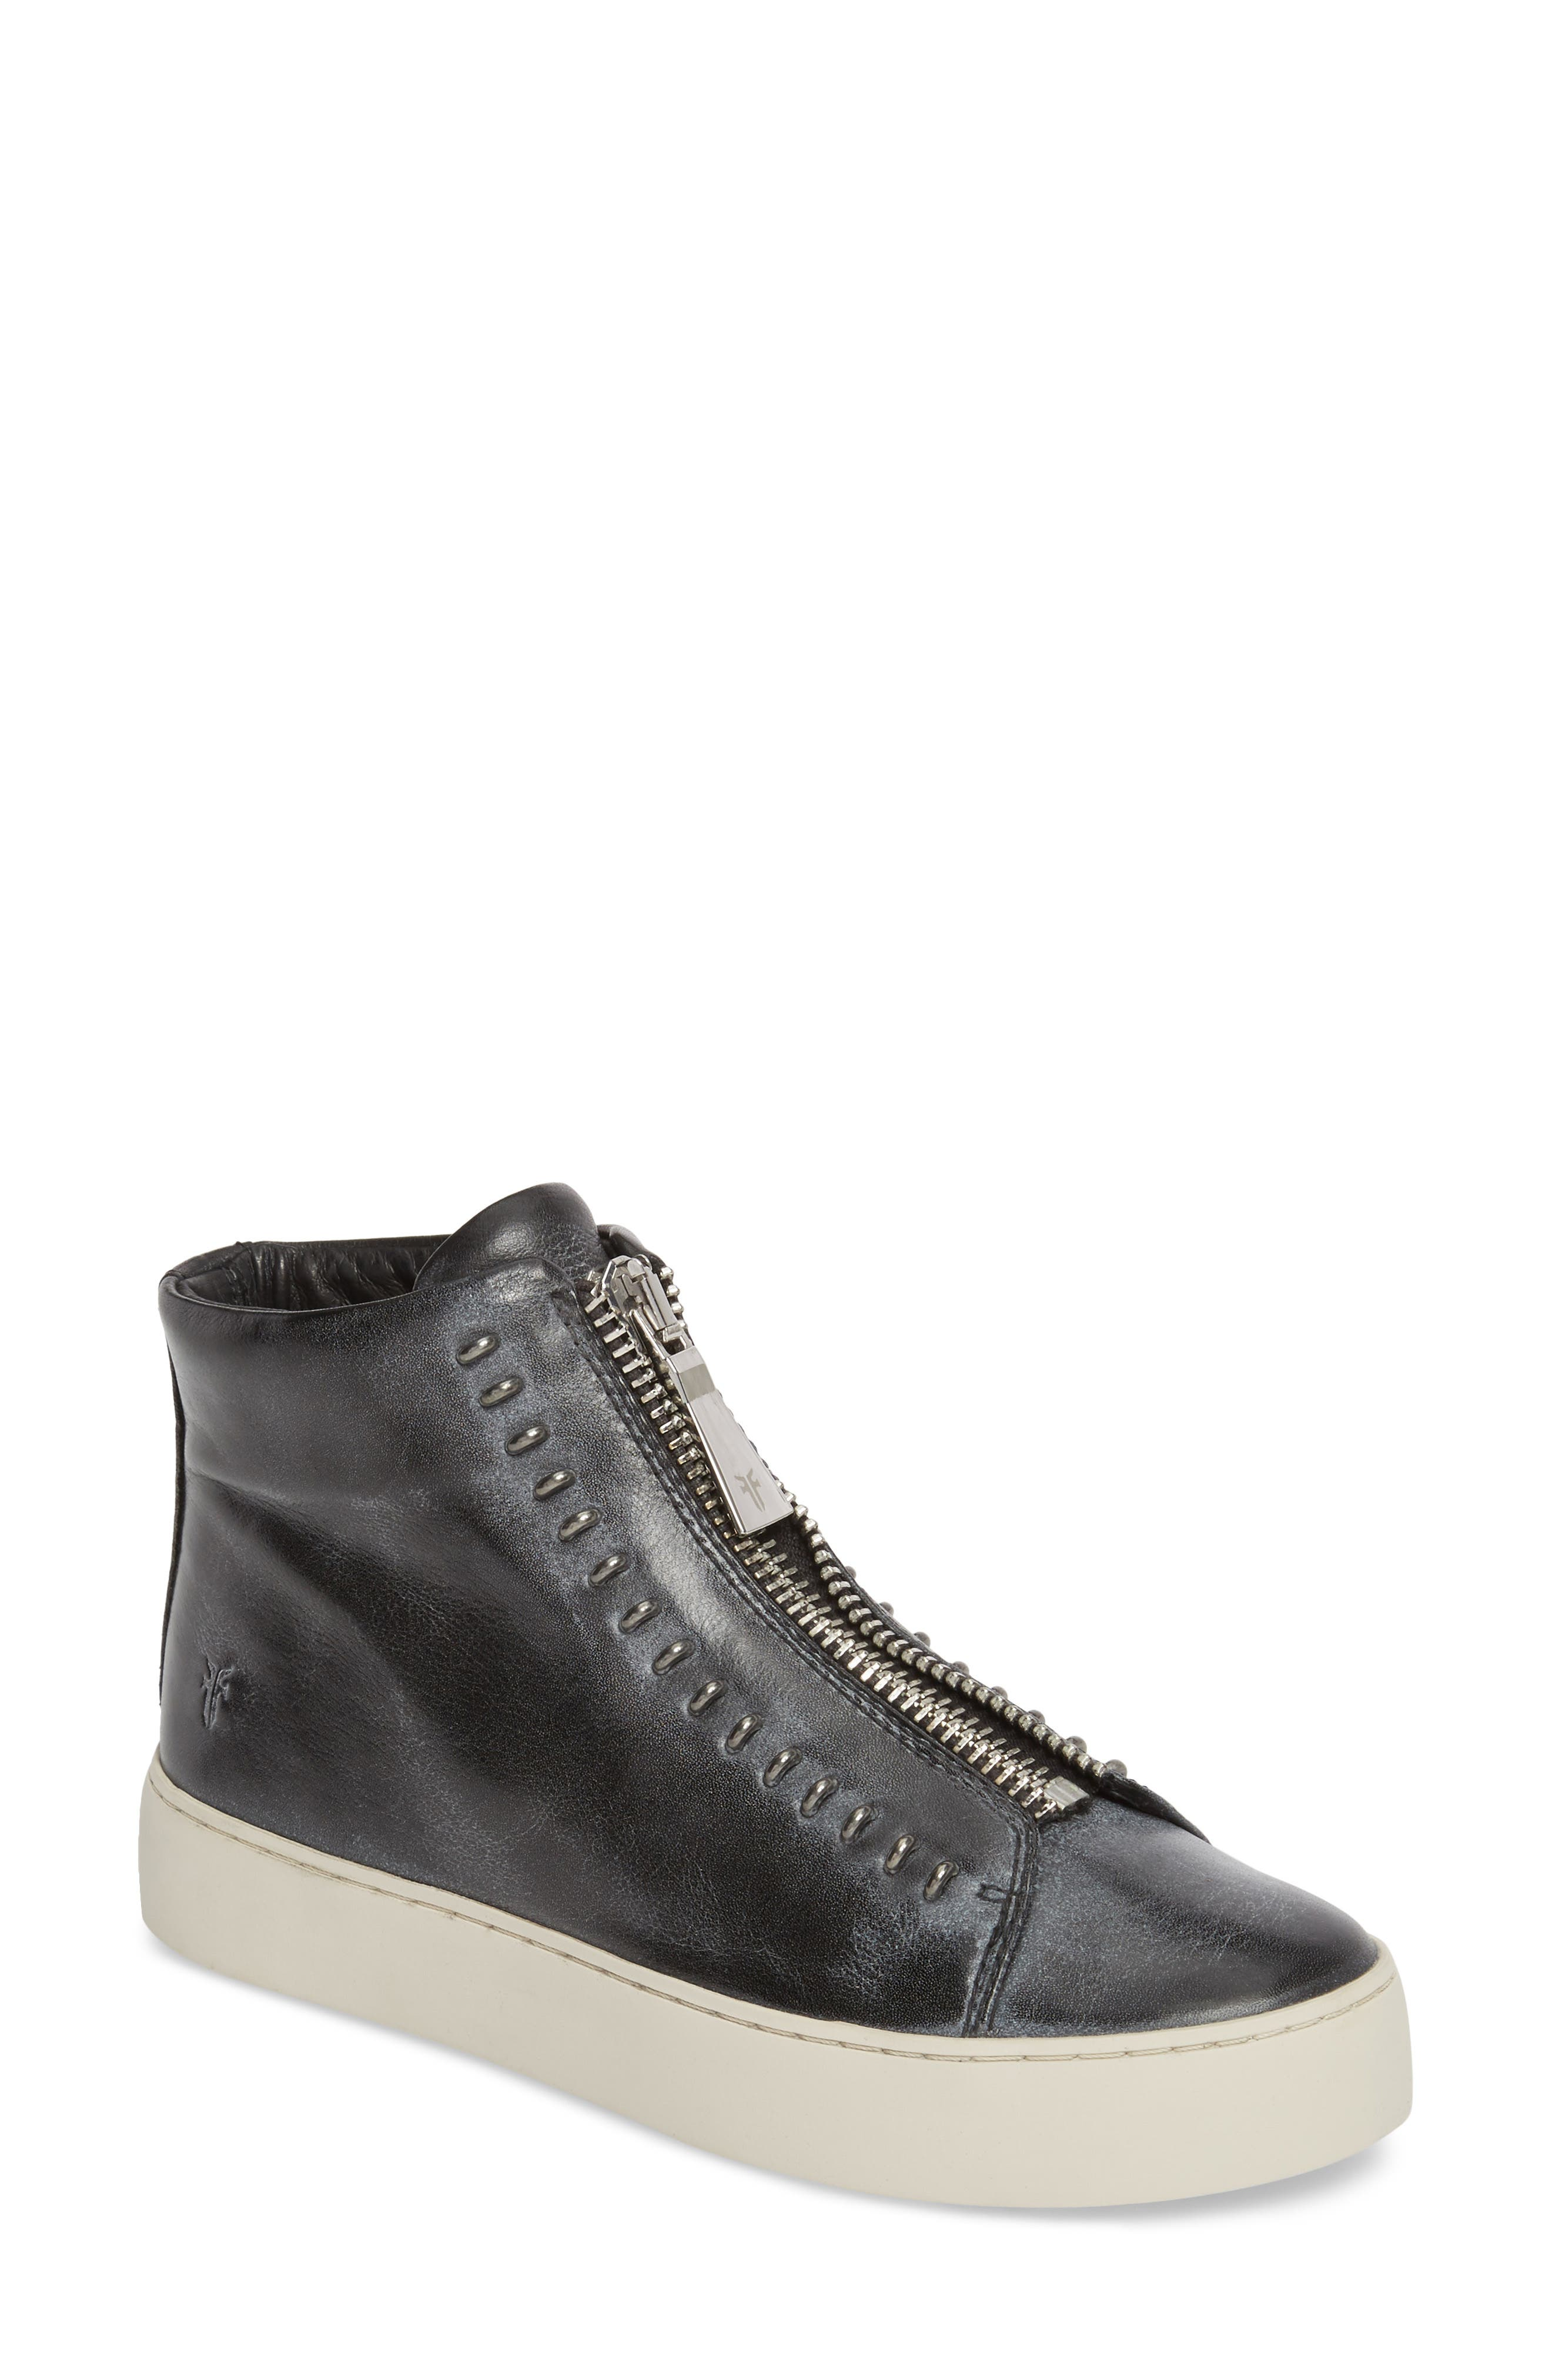 Frye Lena Rebel Zip High Top Sneaker